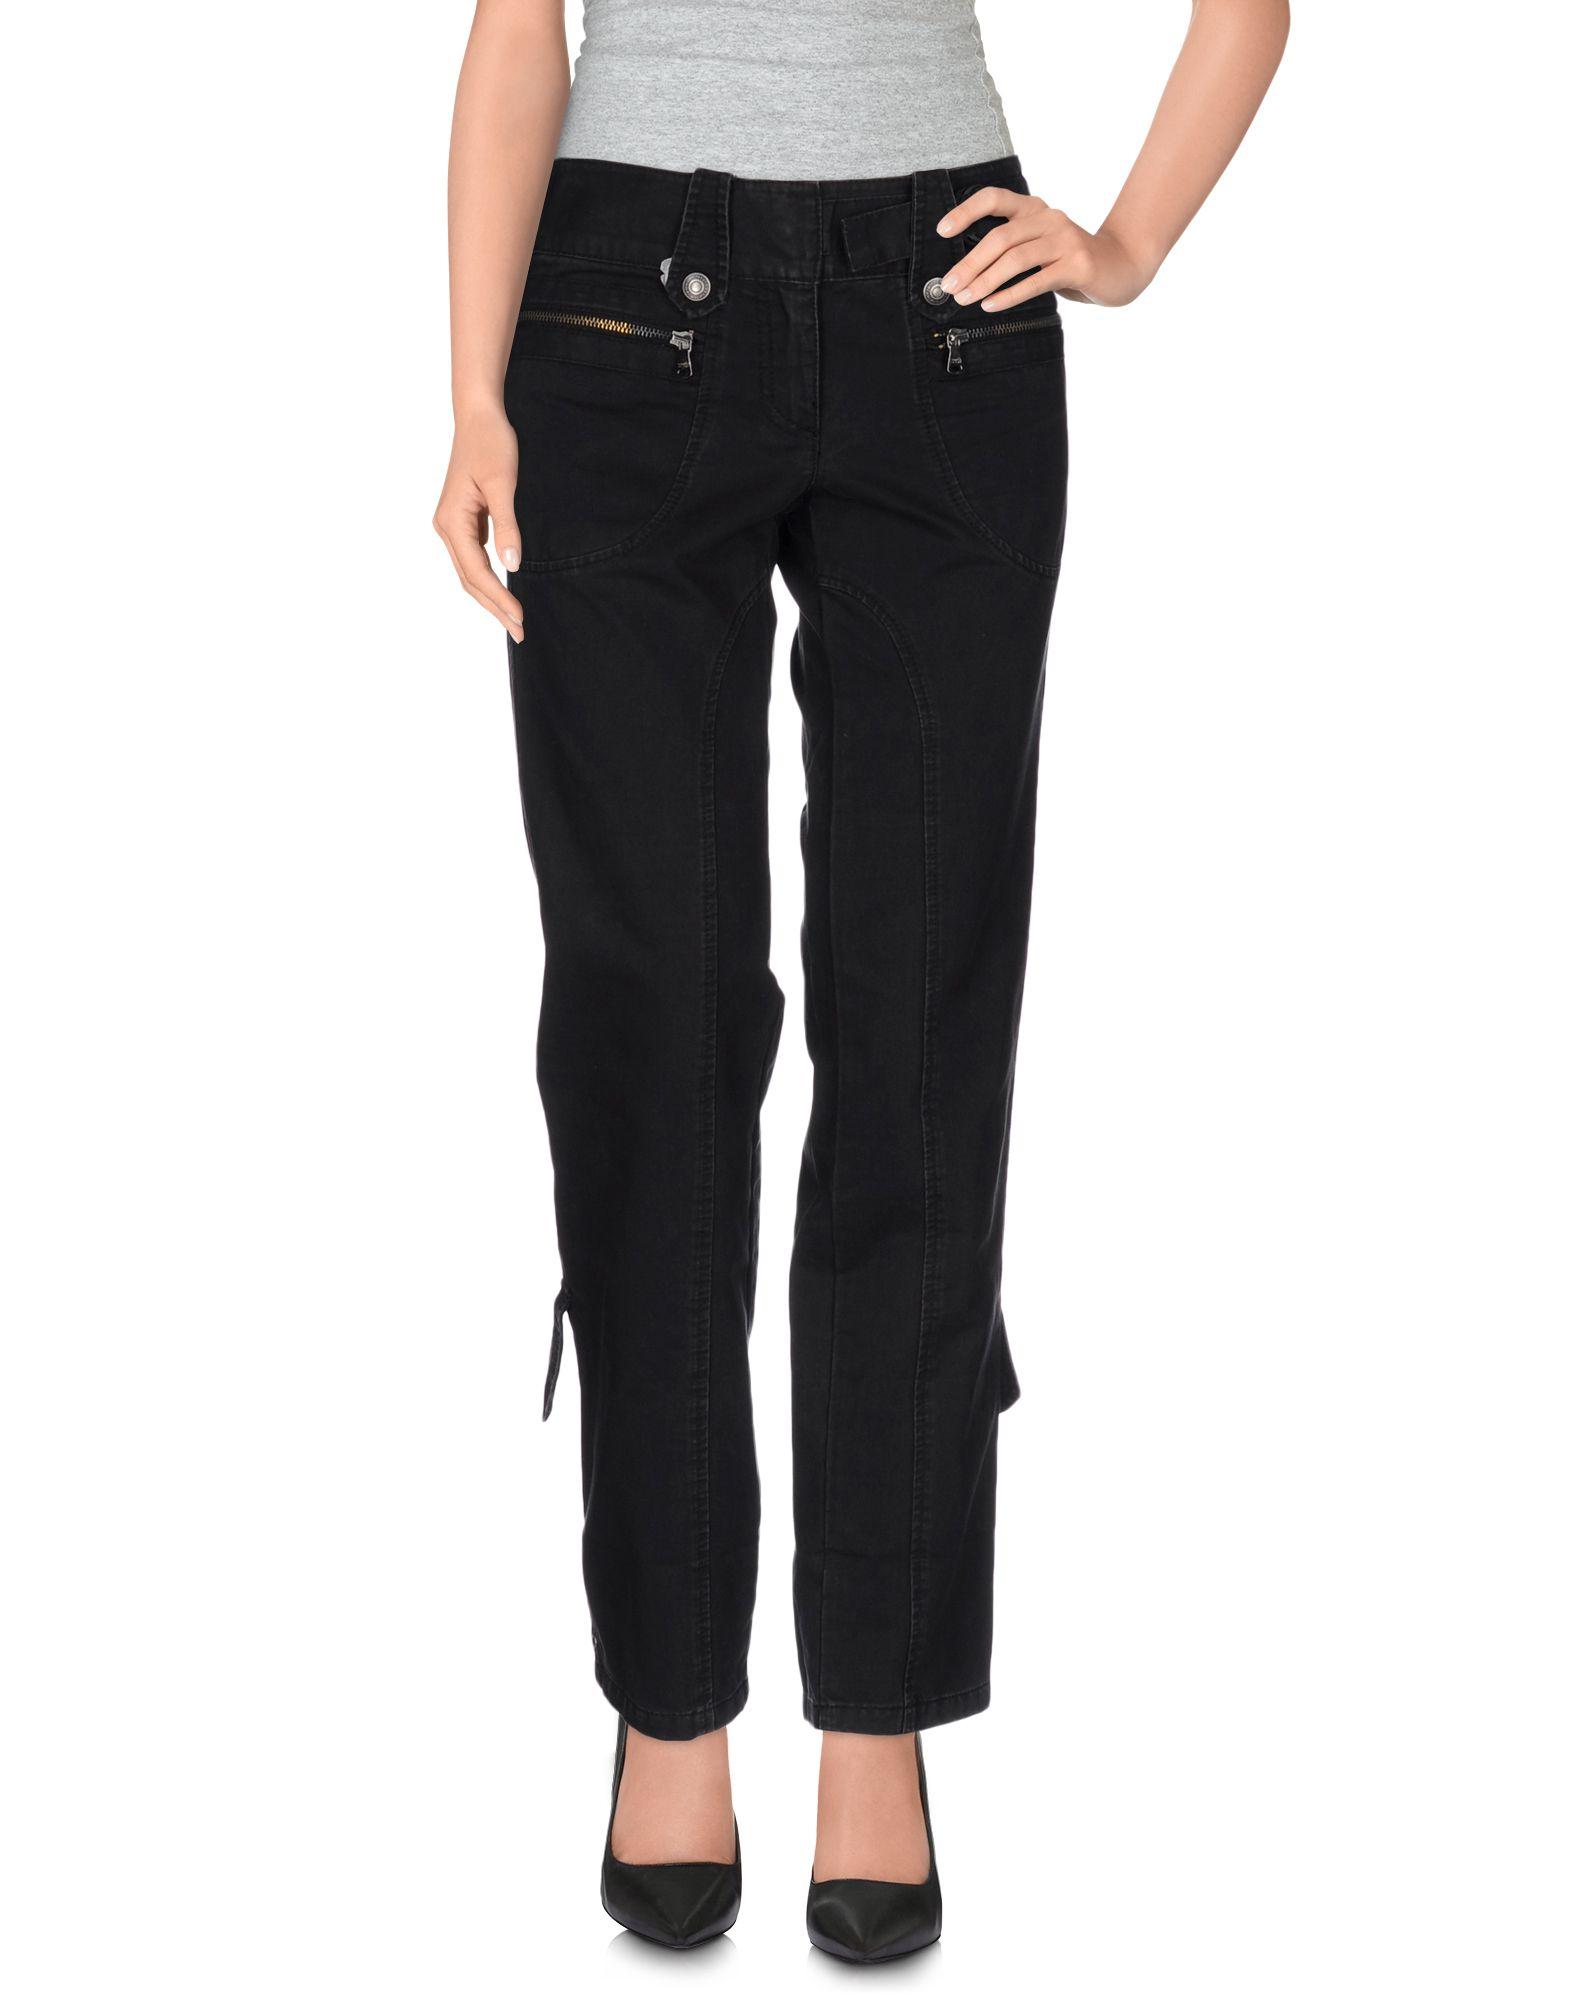 26 luxury calvin klein pants for women  u2013 playzoa com